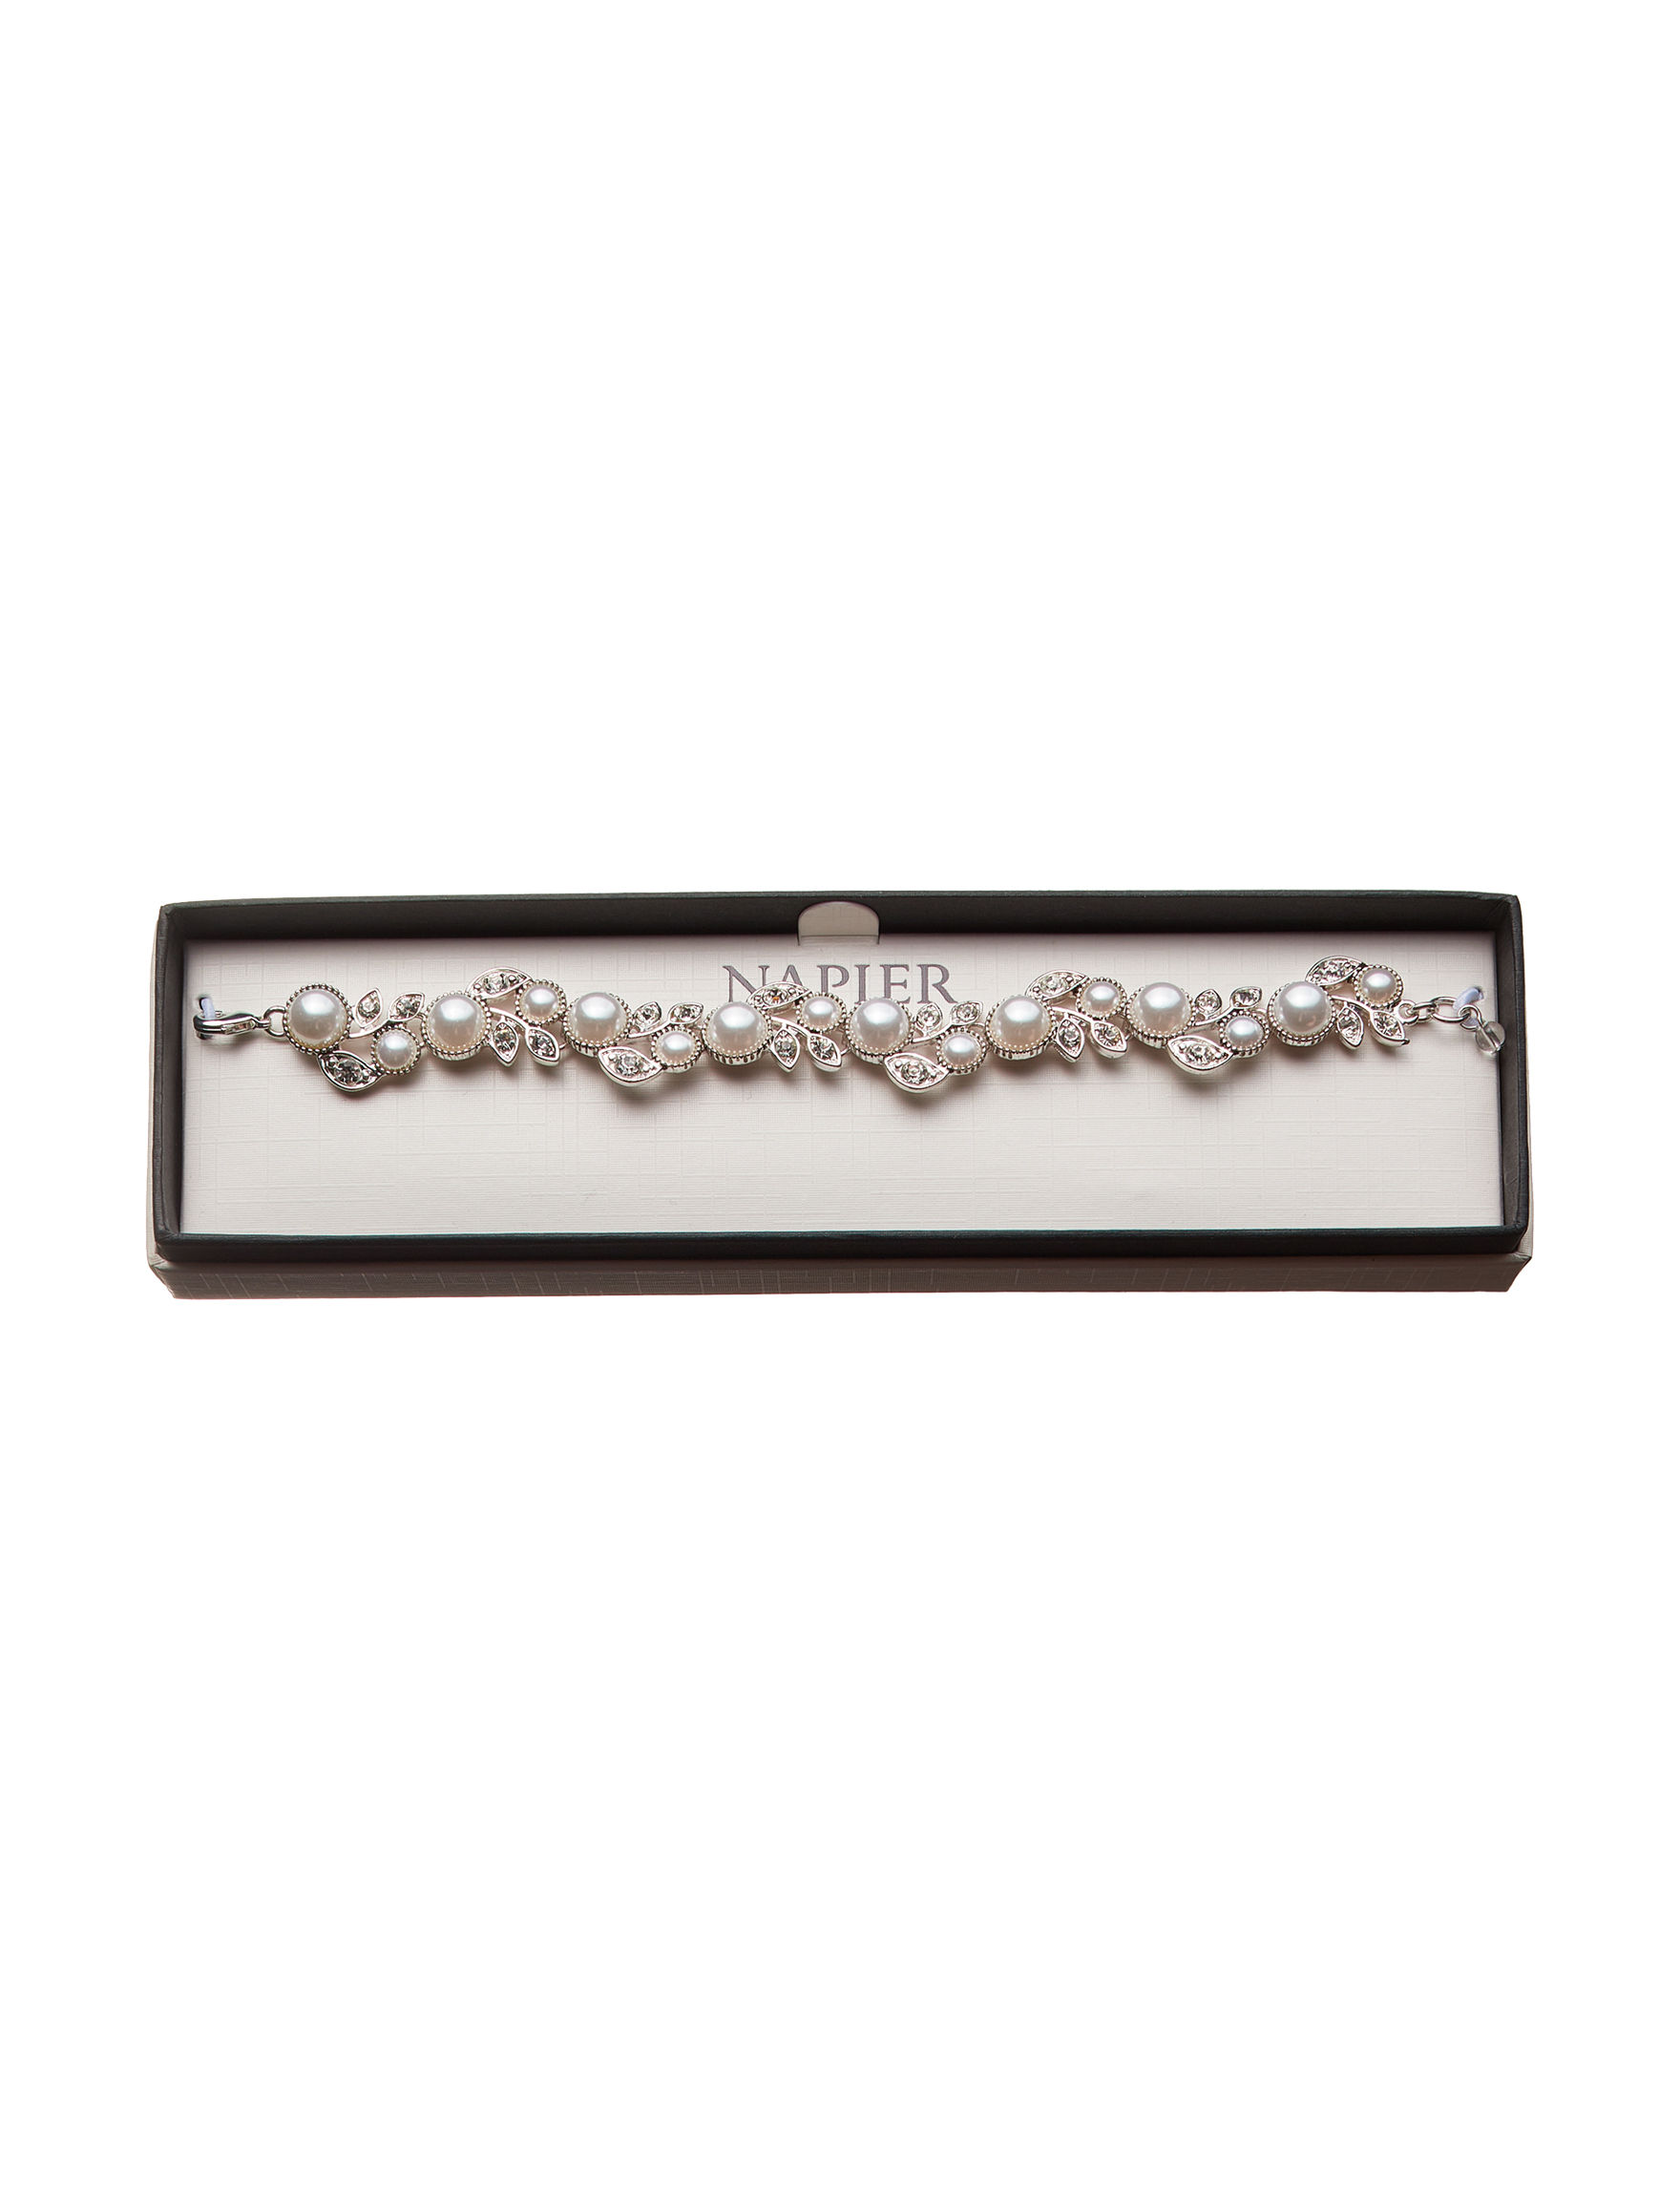 Napier Silver Bracelets Fashion Jewelry